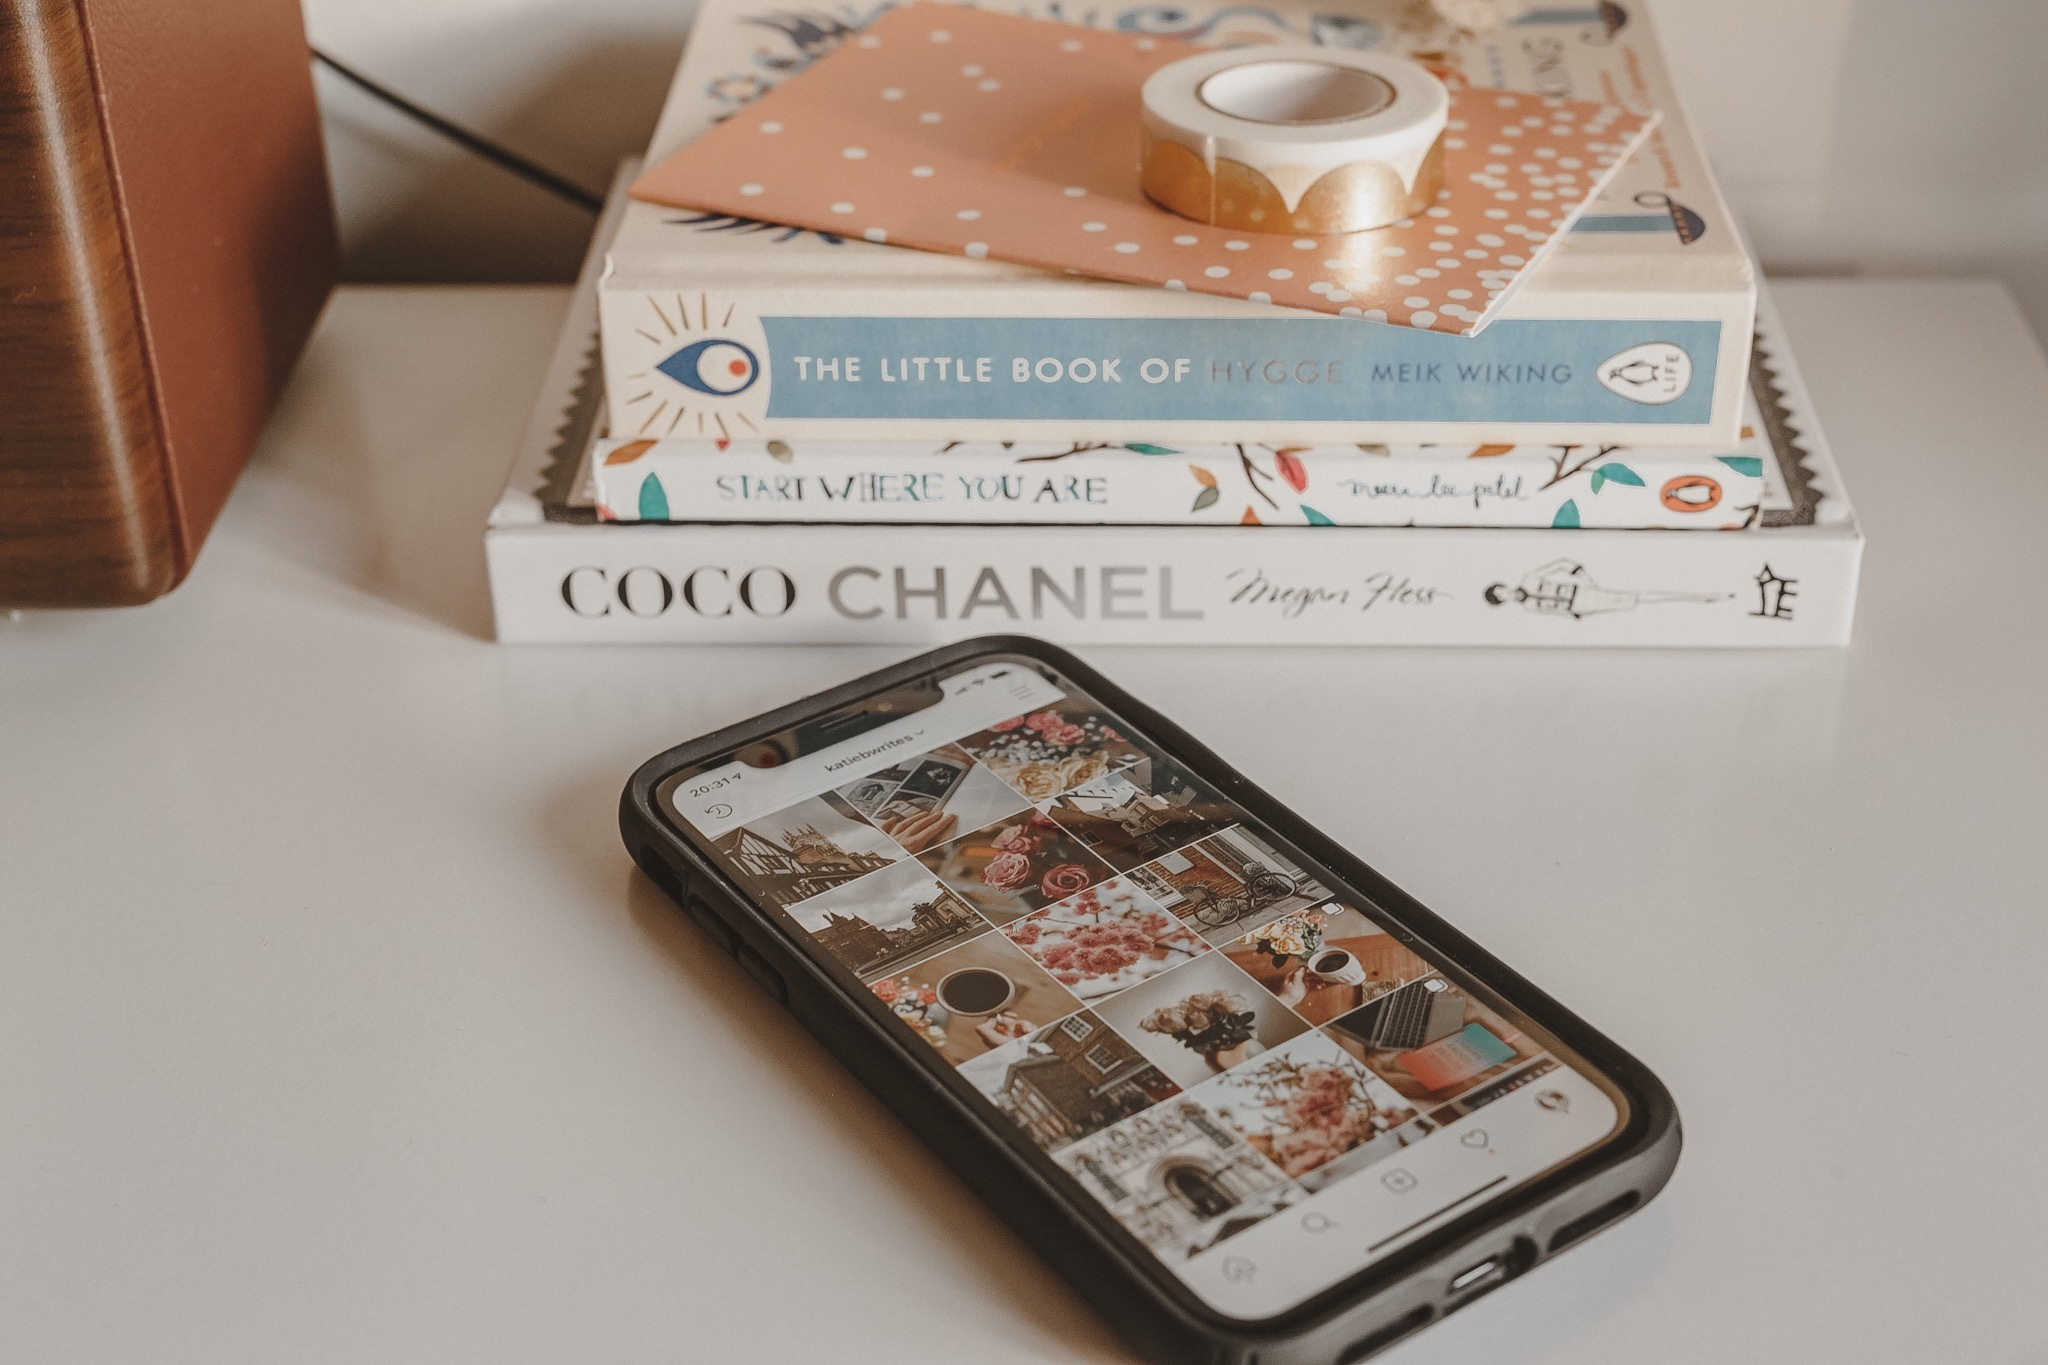 Flatlay, Stationery, Books, iPhone XR, iPhone, Instagram, Derbyshire Bloggers, British Bloggers, Katiebwrites, Katie Writes,